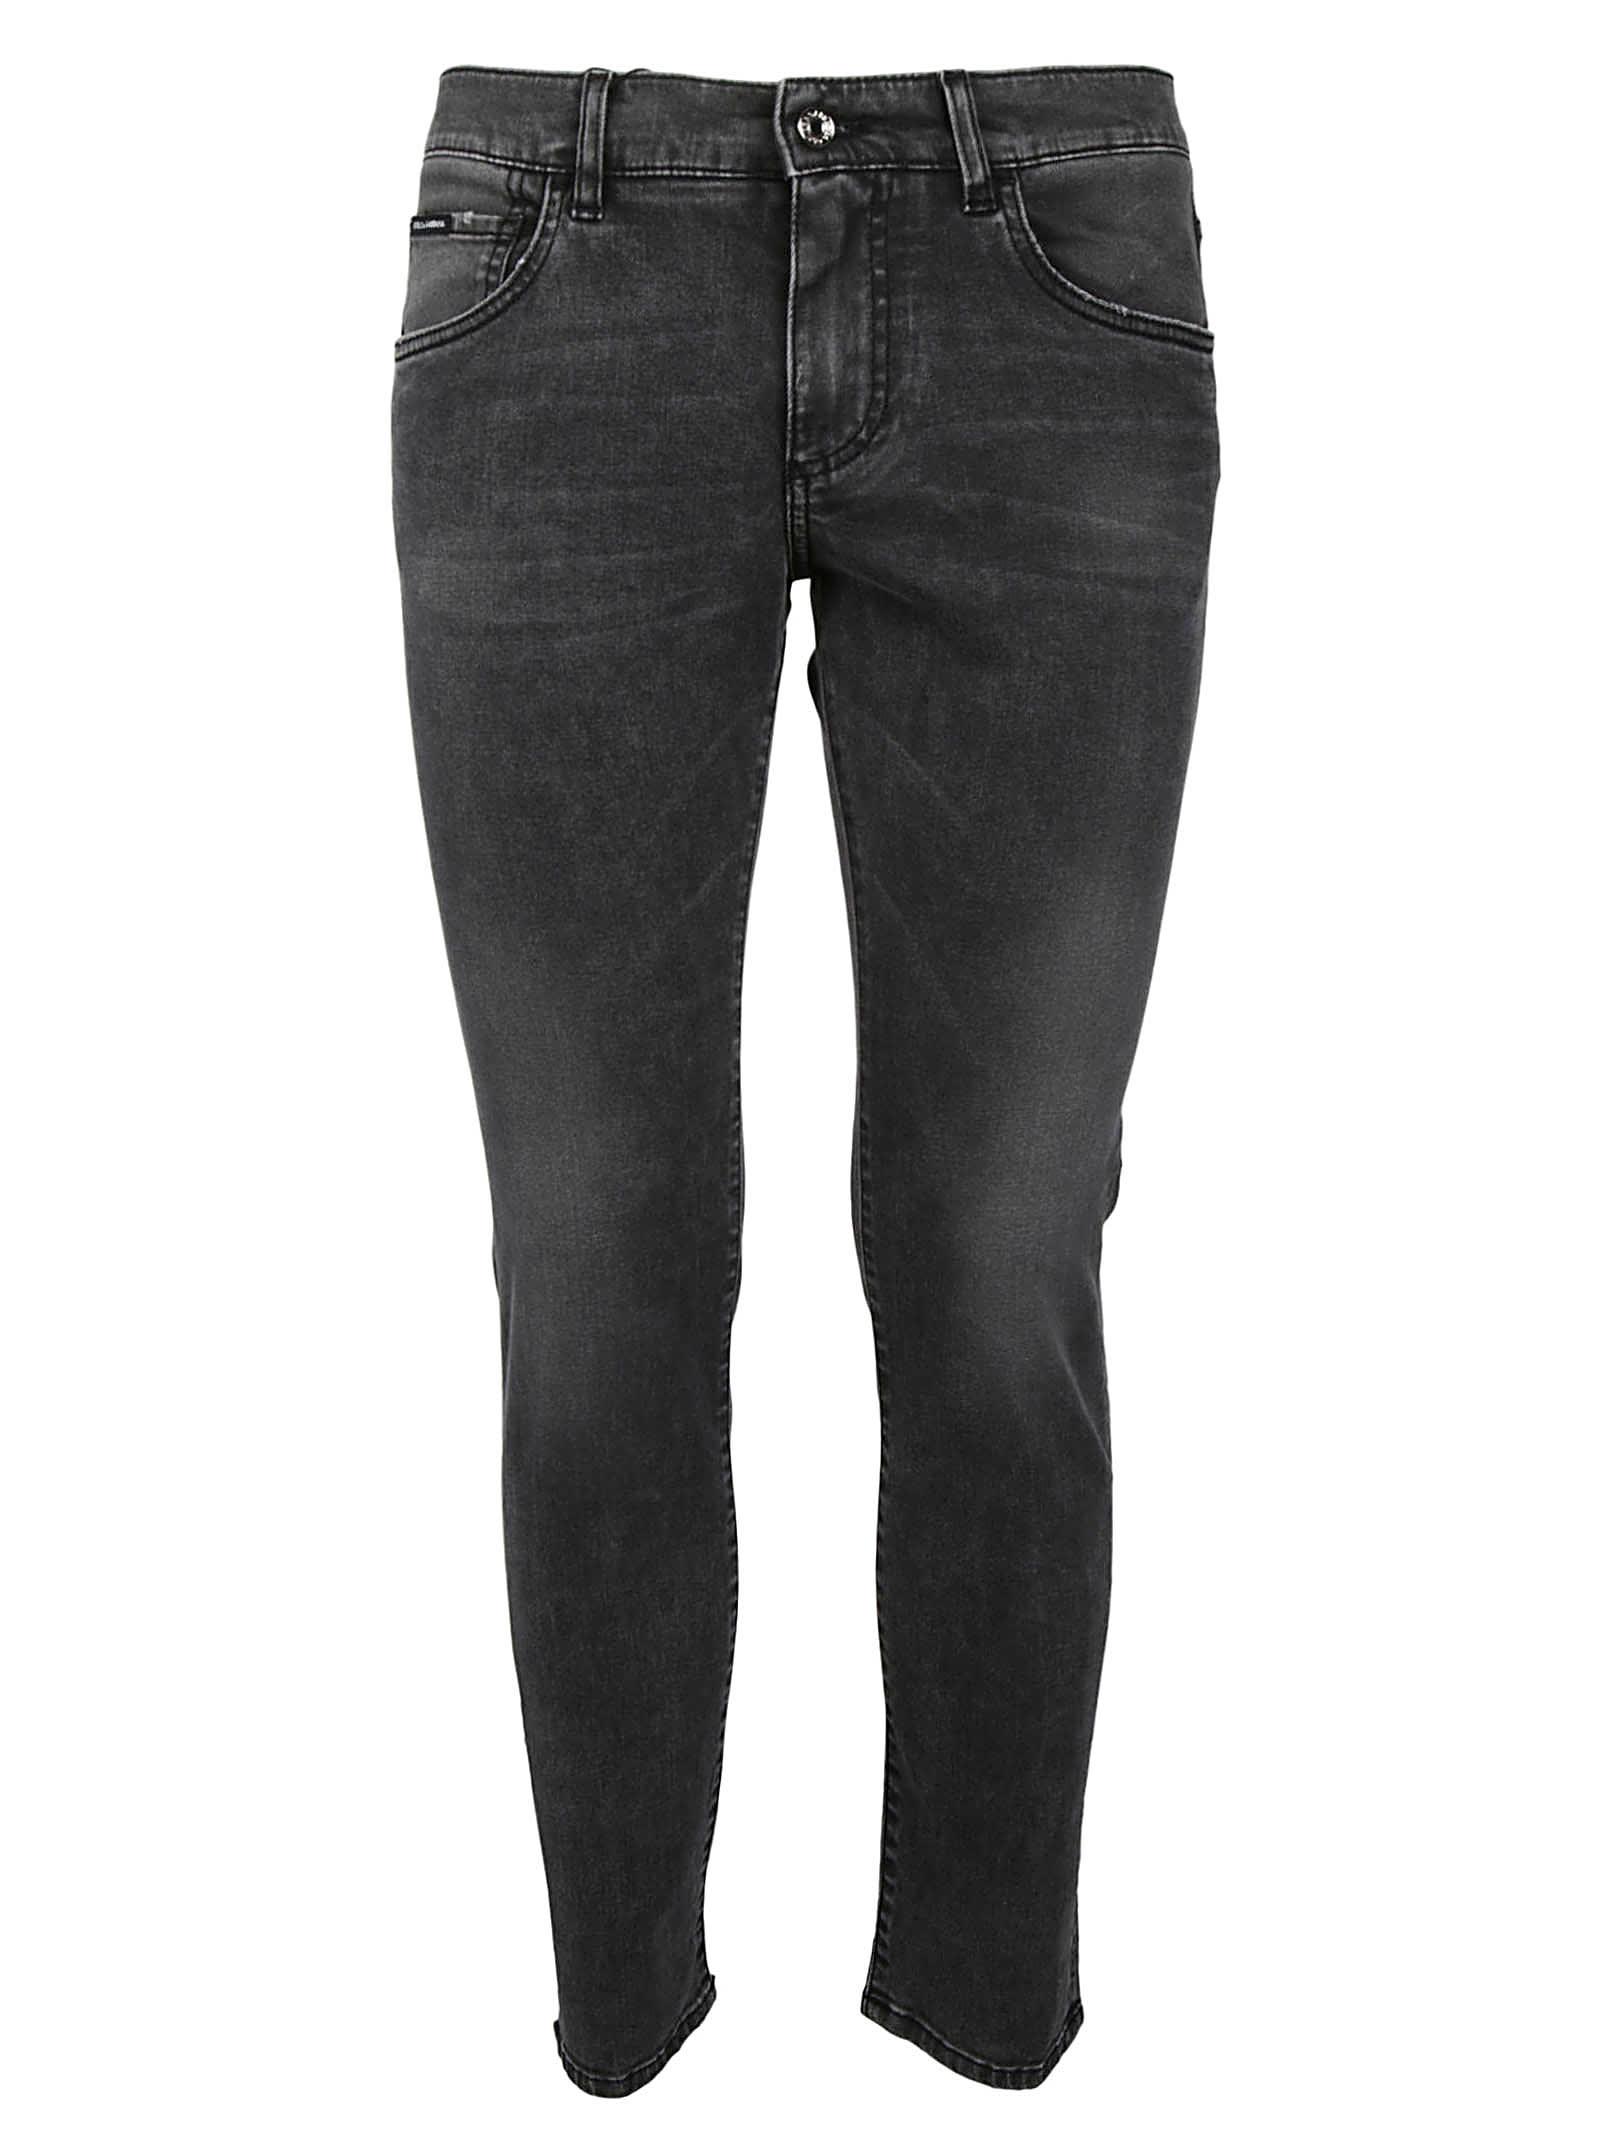 Dolce & Gabbana Stonewashed Jeans